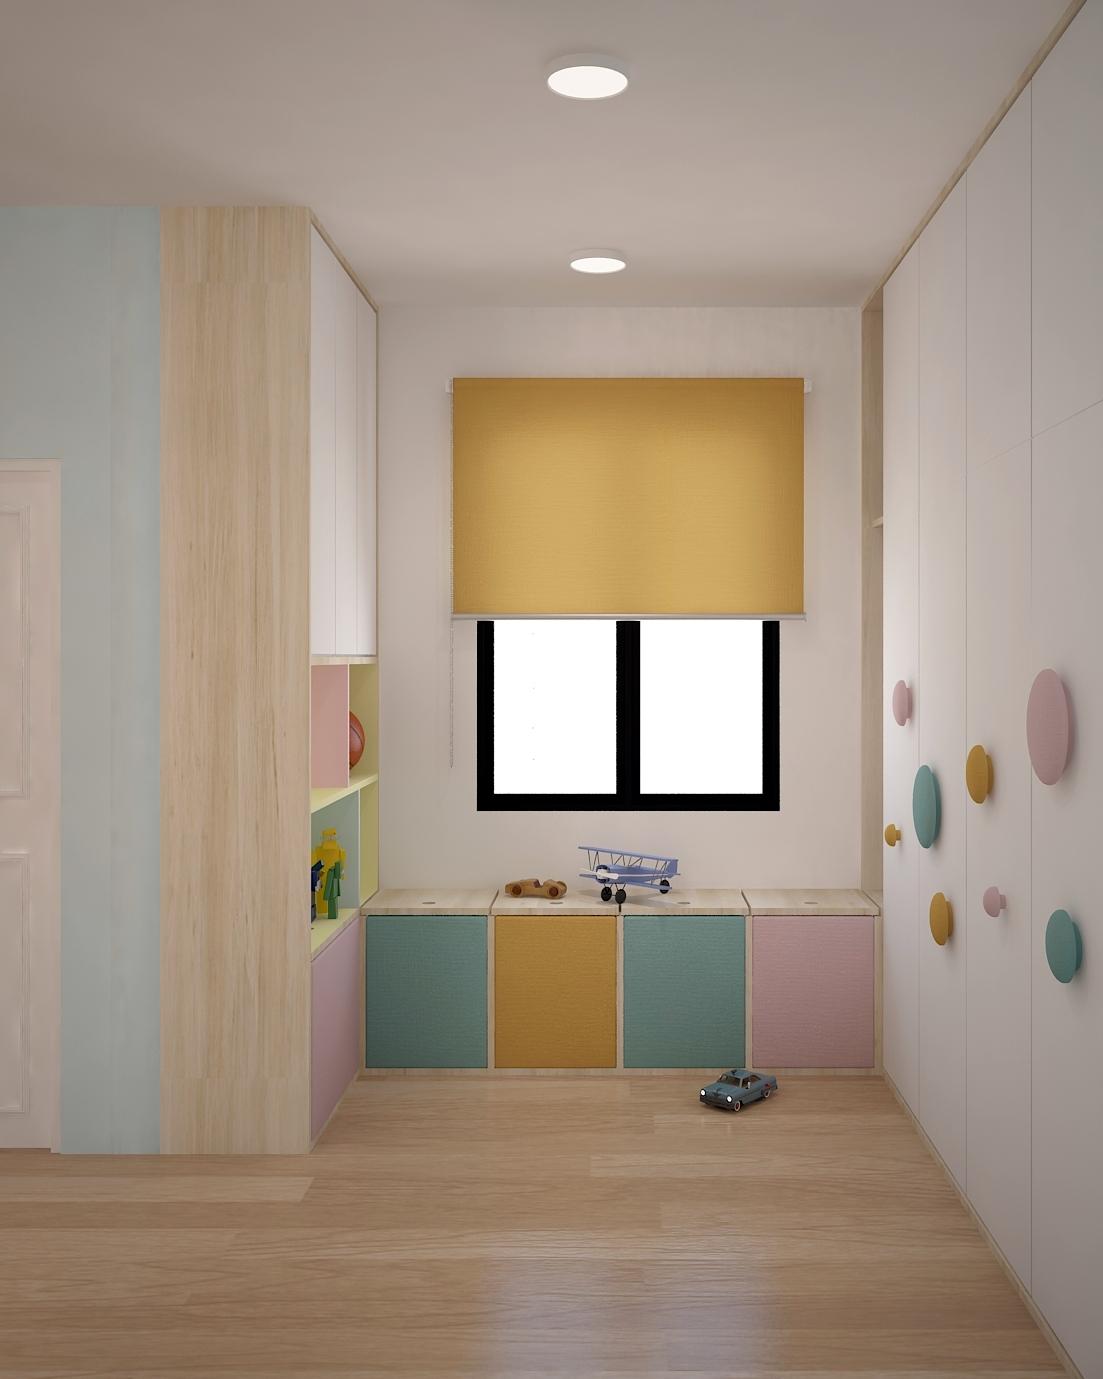 kids-room-interior-design-penang-1